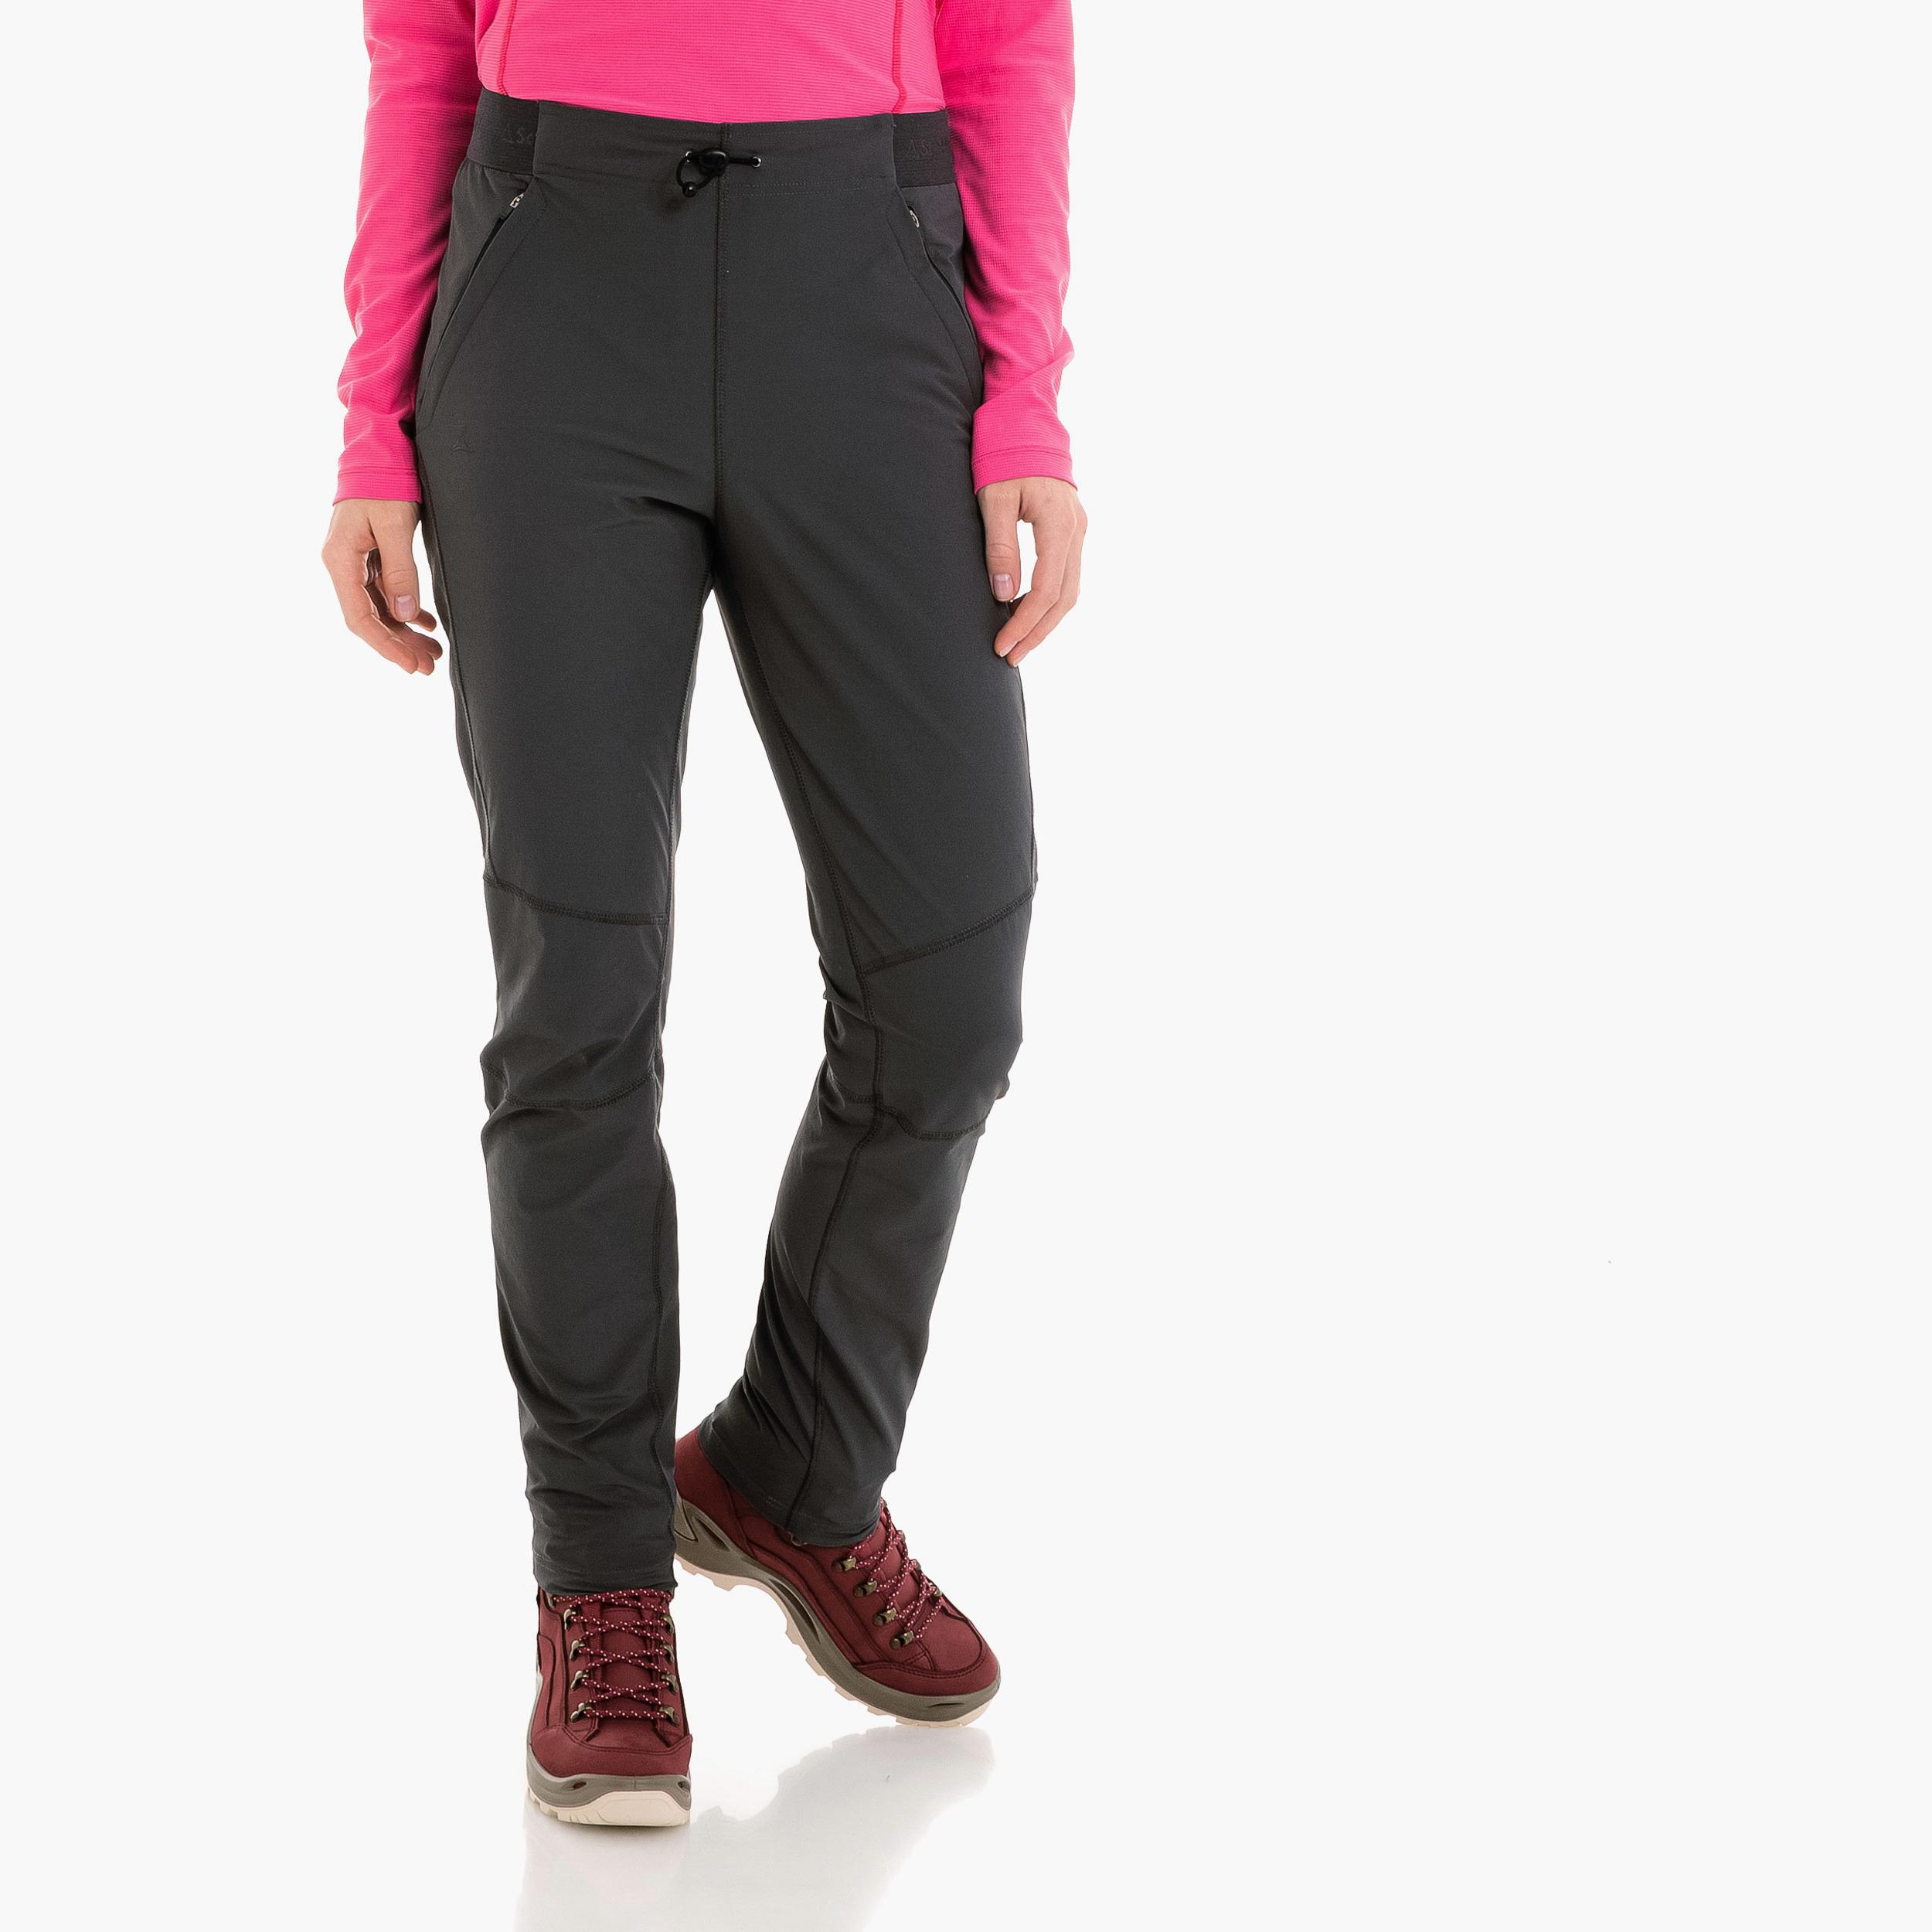 Pants Tight